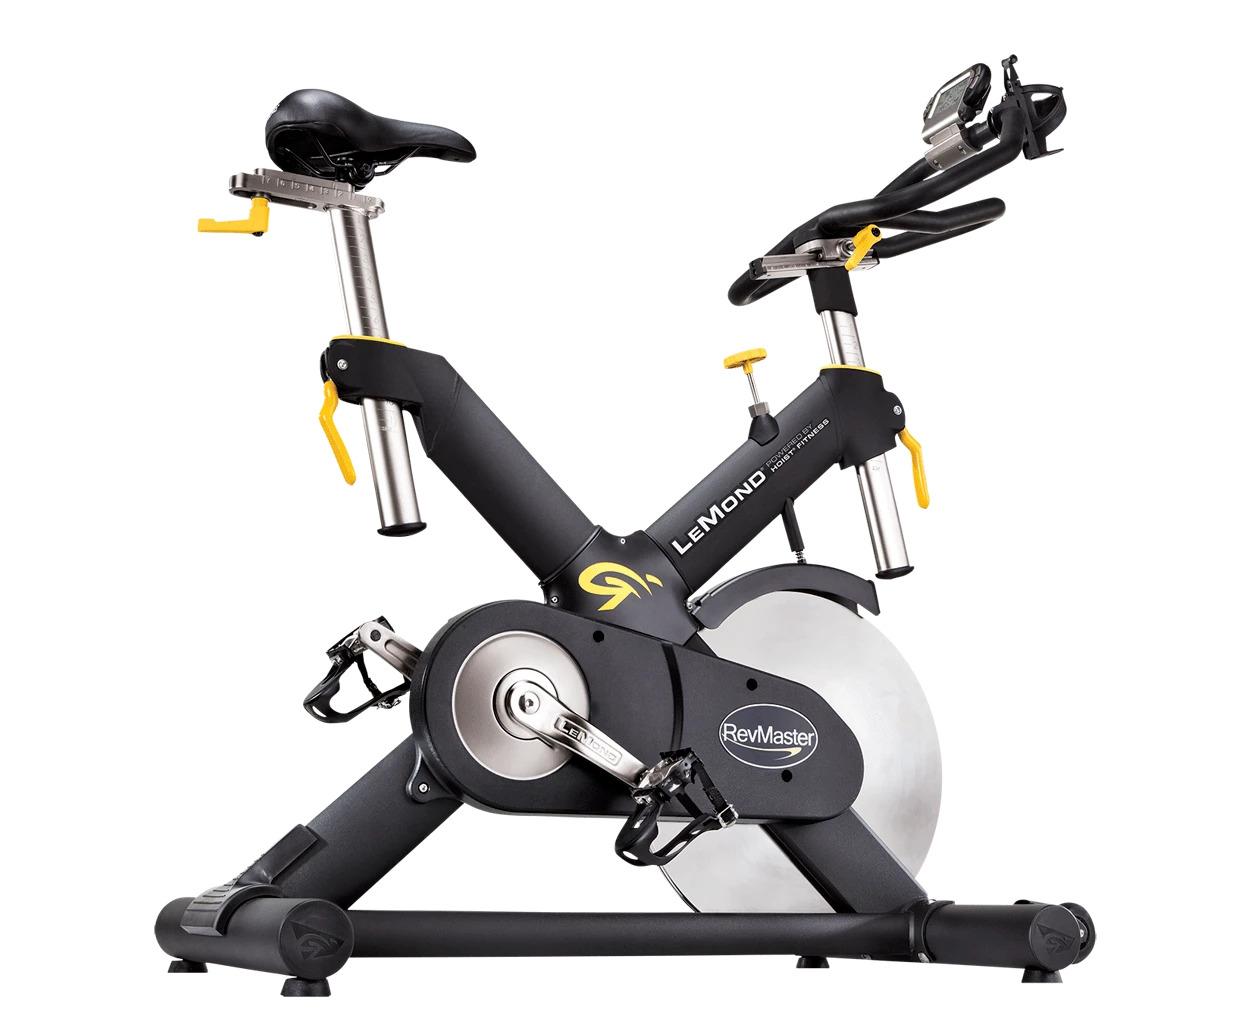 xe đạp hoist lemond revmaster pro